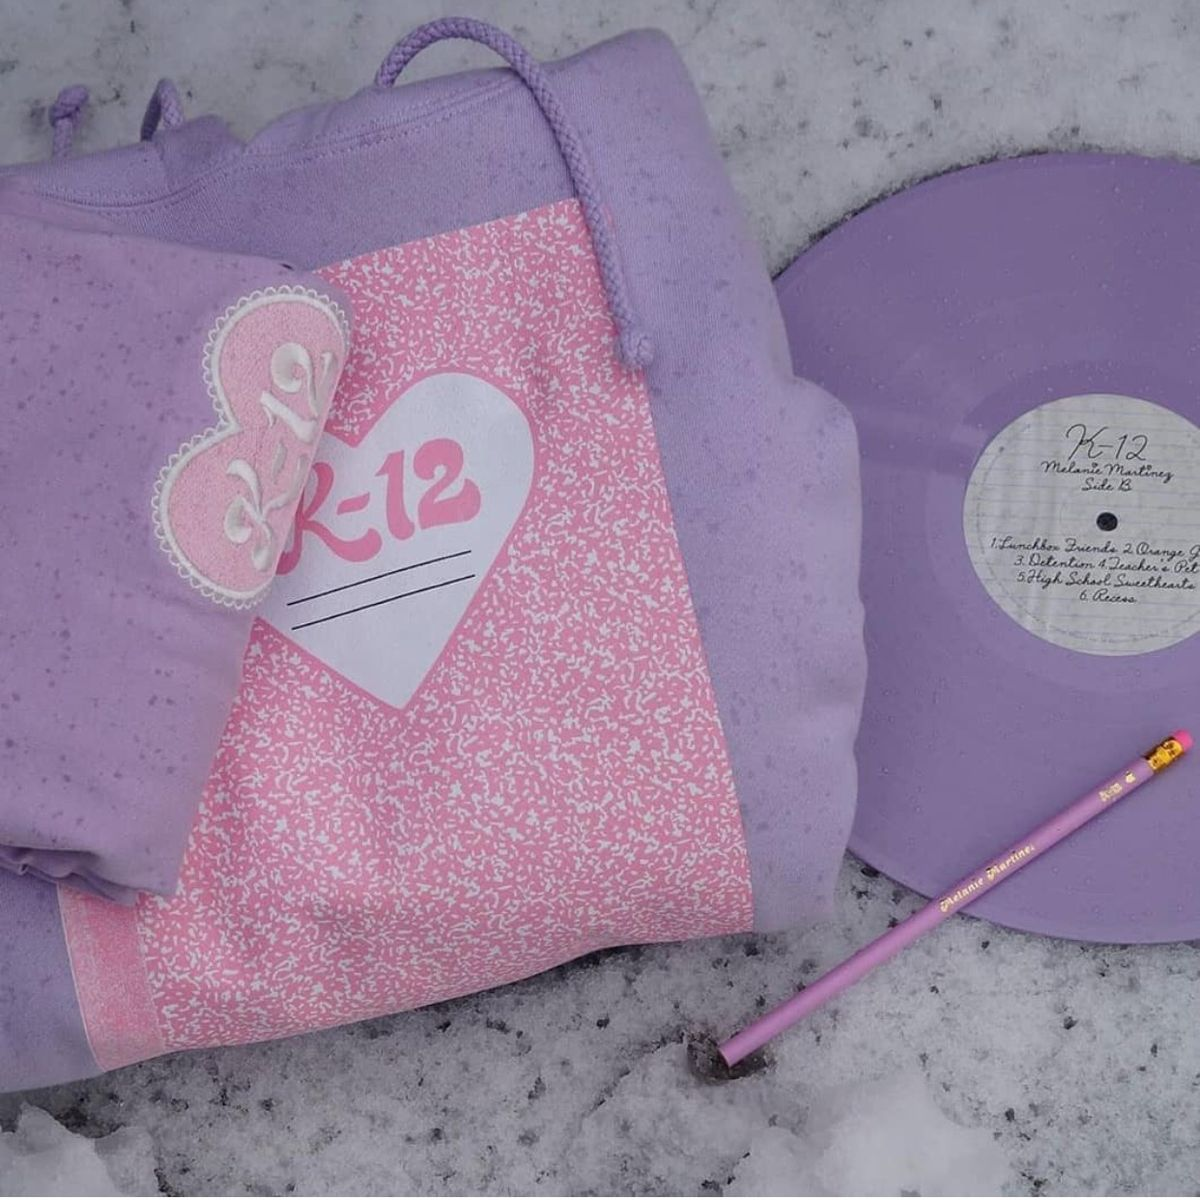 The Lilac Vinyl Is So Cute Melanie Martinez Merch Melanie Martinez Melanie